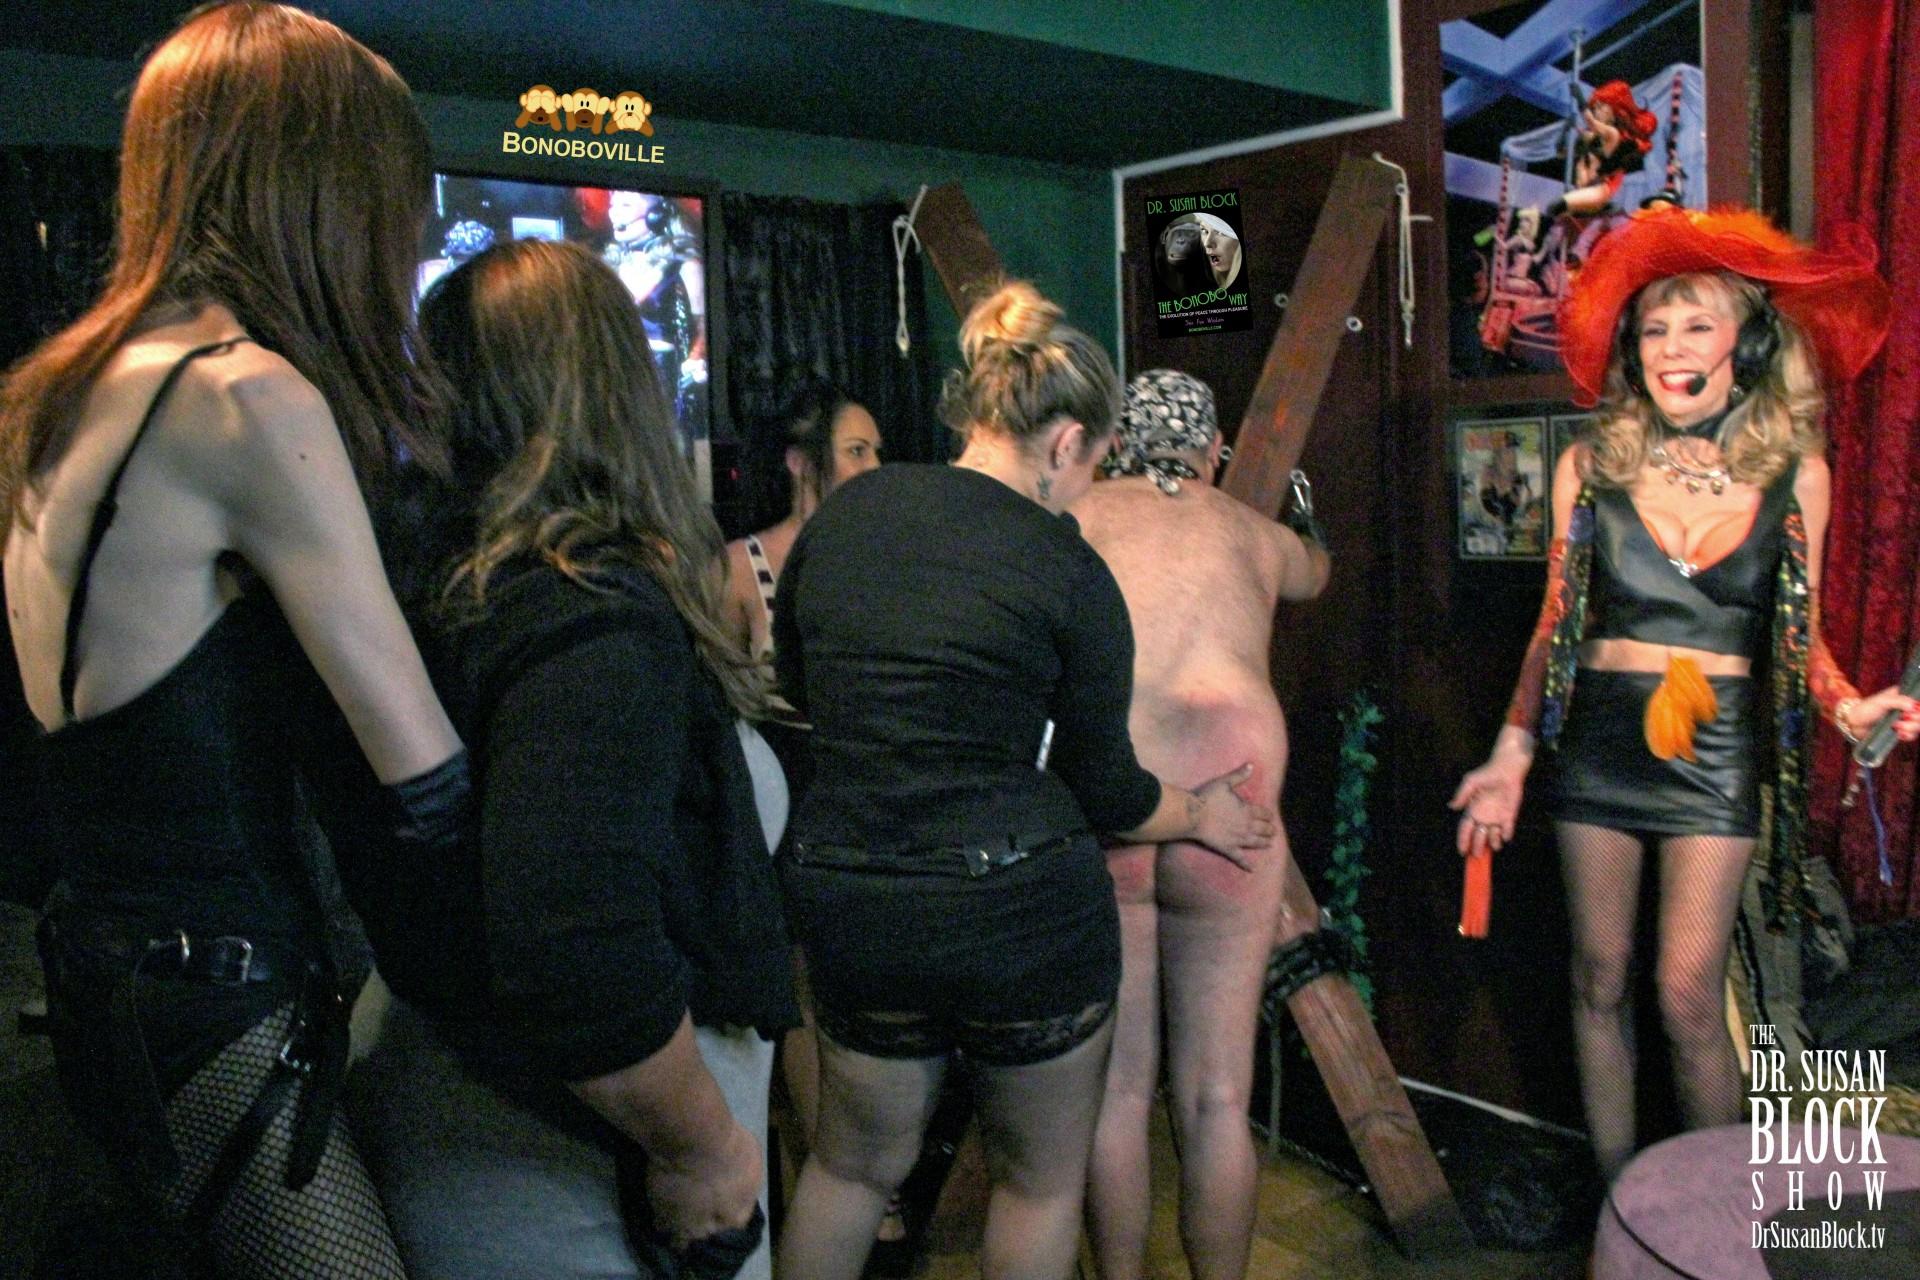 Sanctuary FemDoms line up to birthday-spank Jack Nice. Photo: Ono Bo